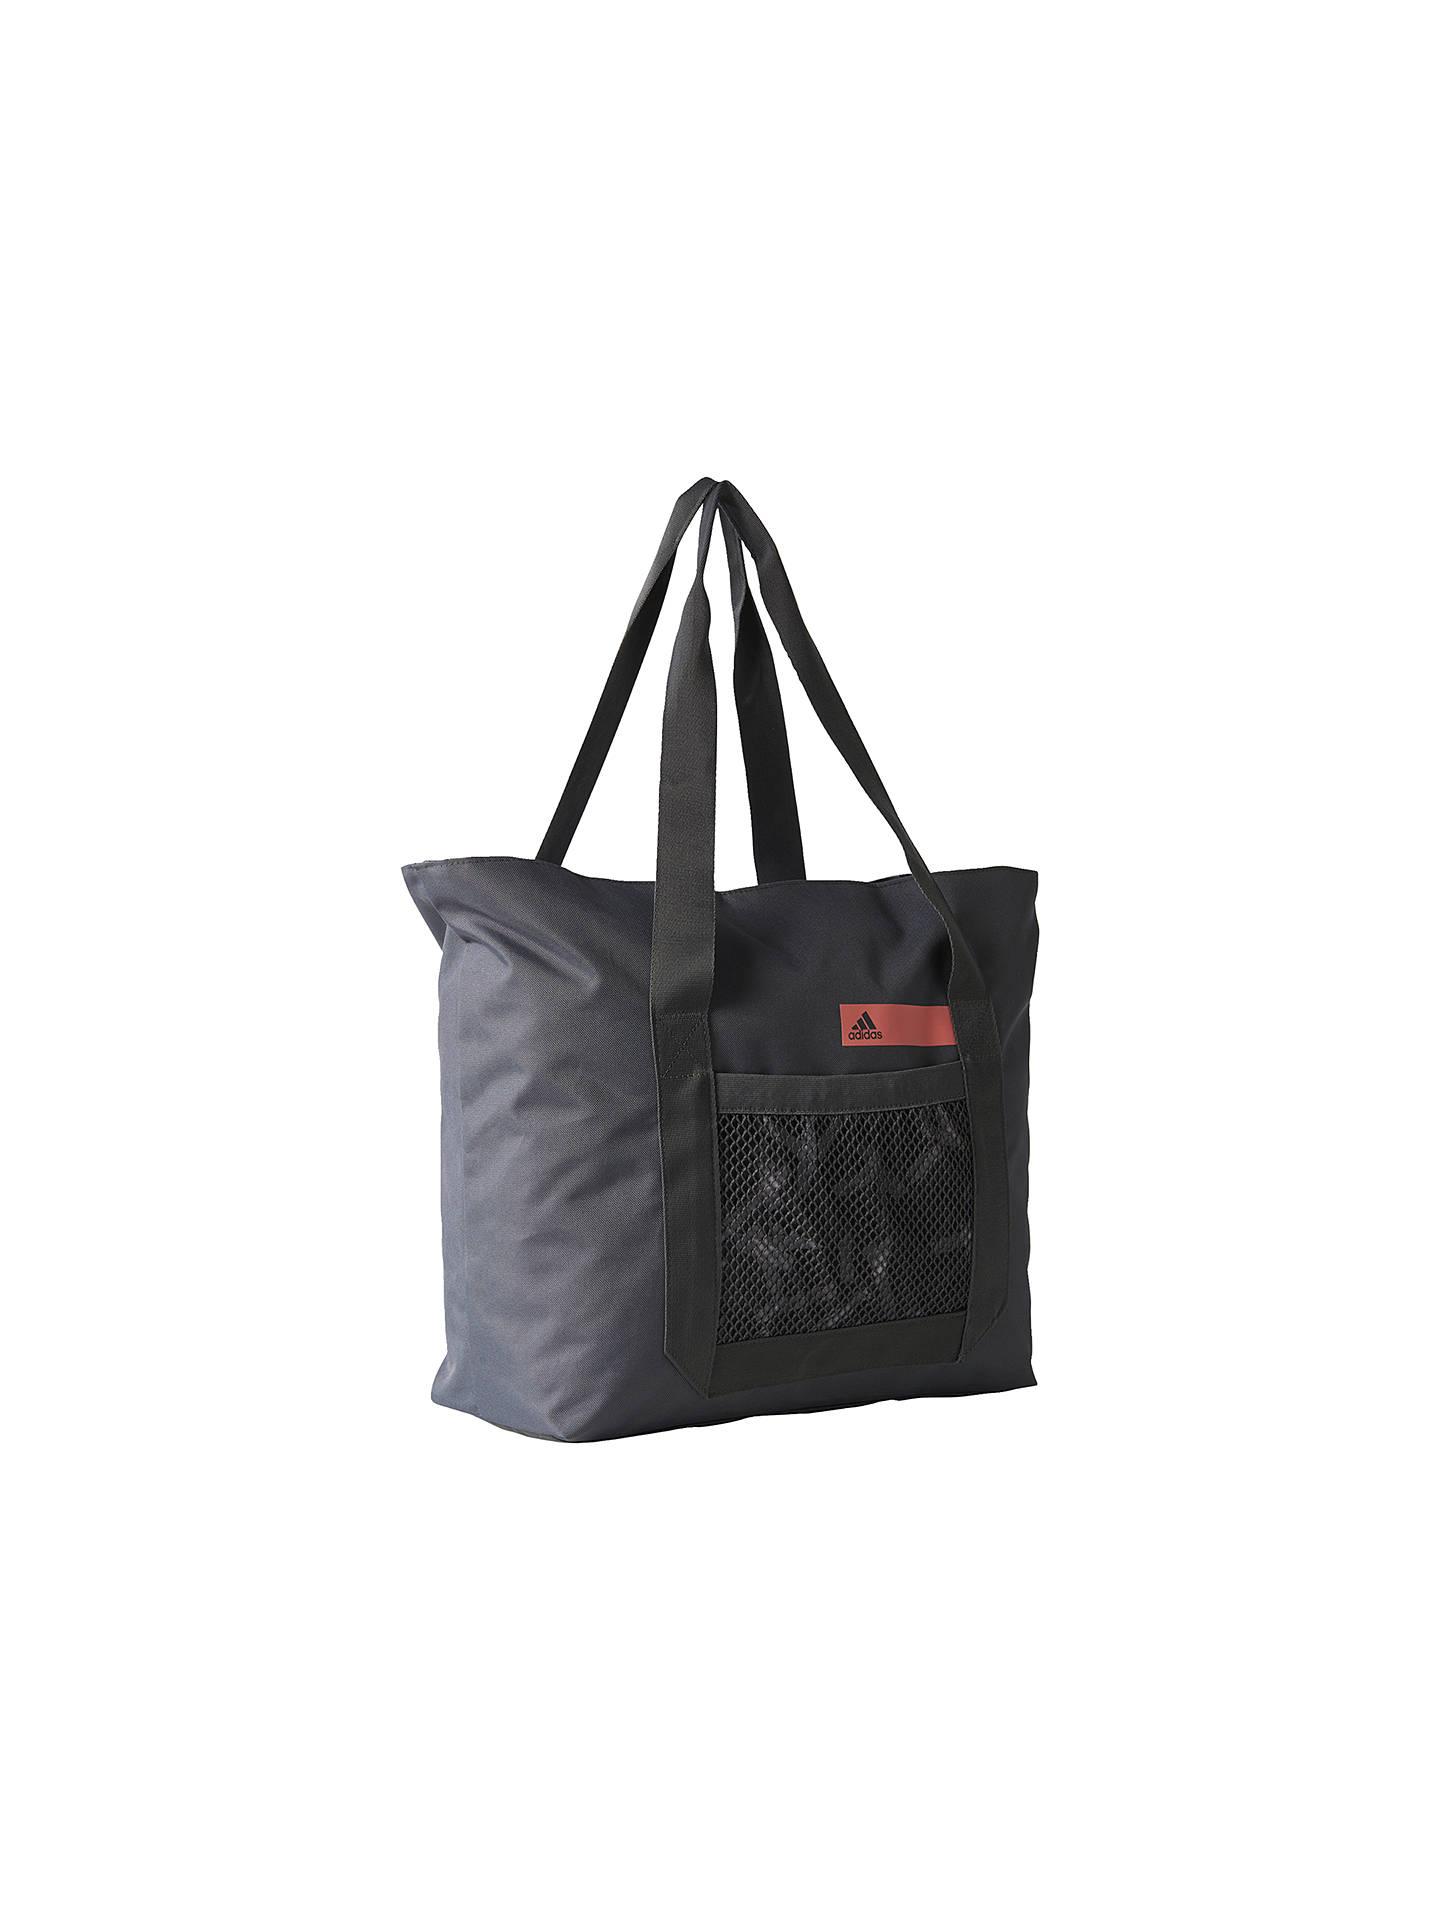 adidas Good Tote Bag at John Lewis   Partners cccfc30f0819c